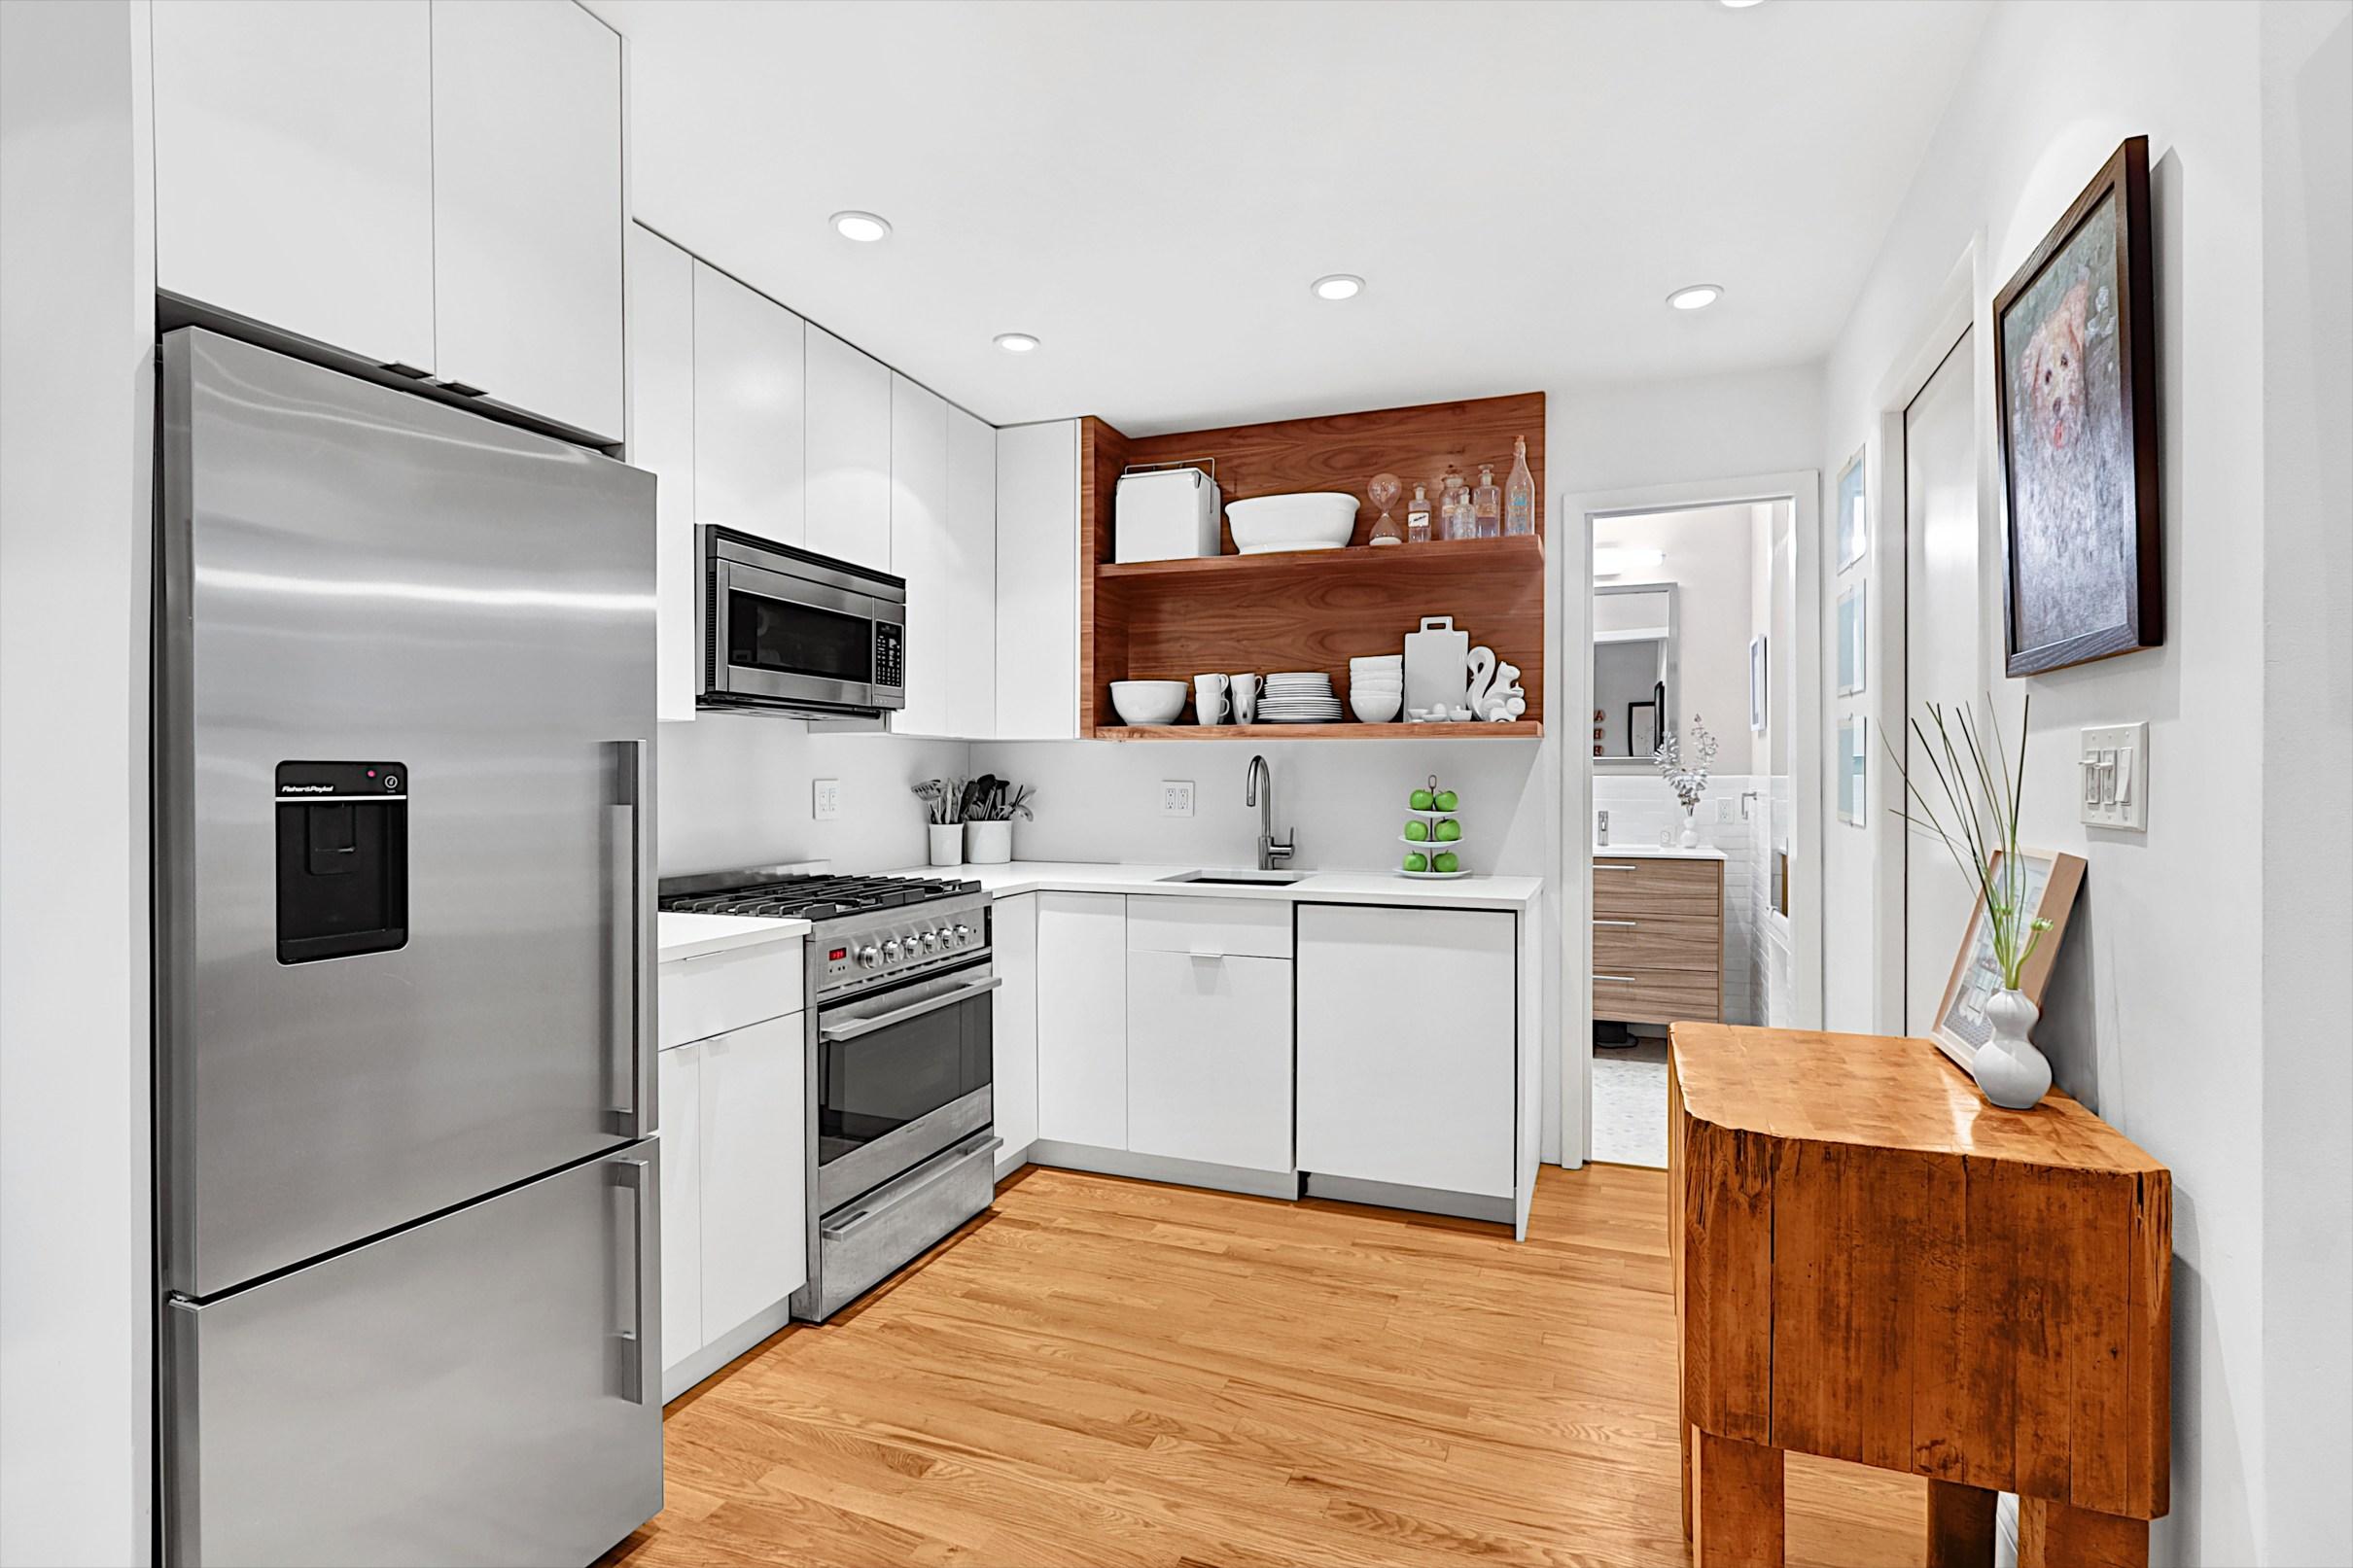 Apartment for sale at 159 Madison Avenue, Apt 4-D